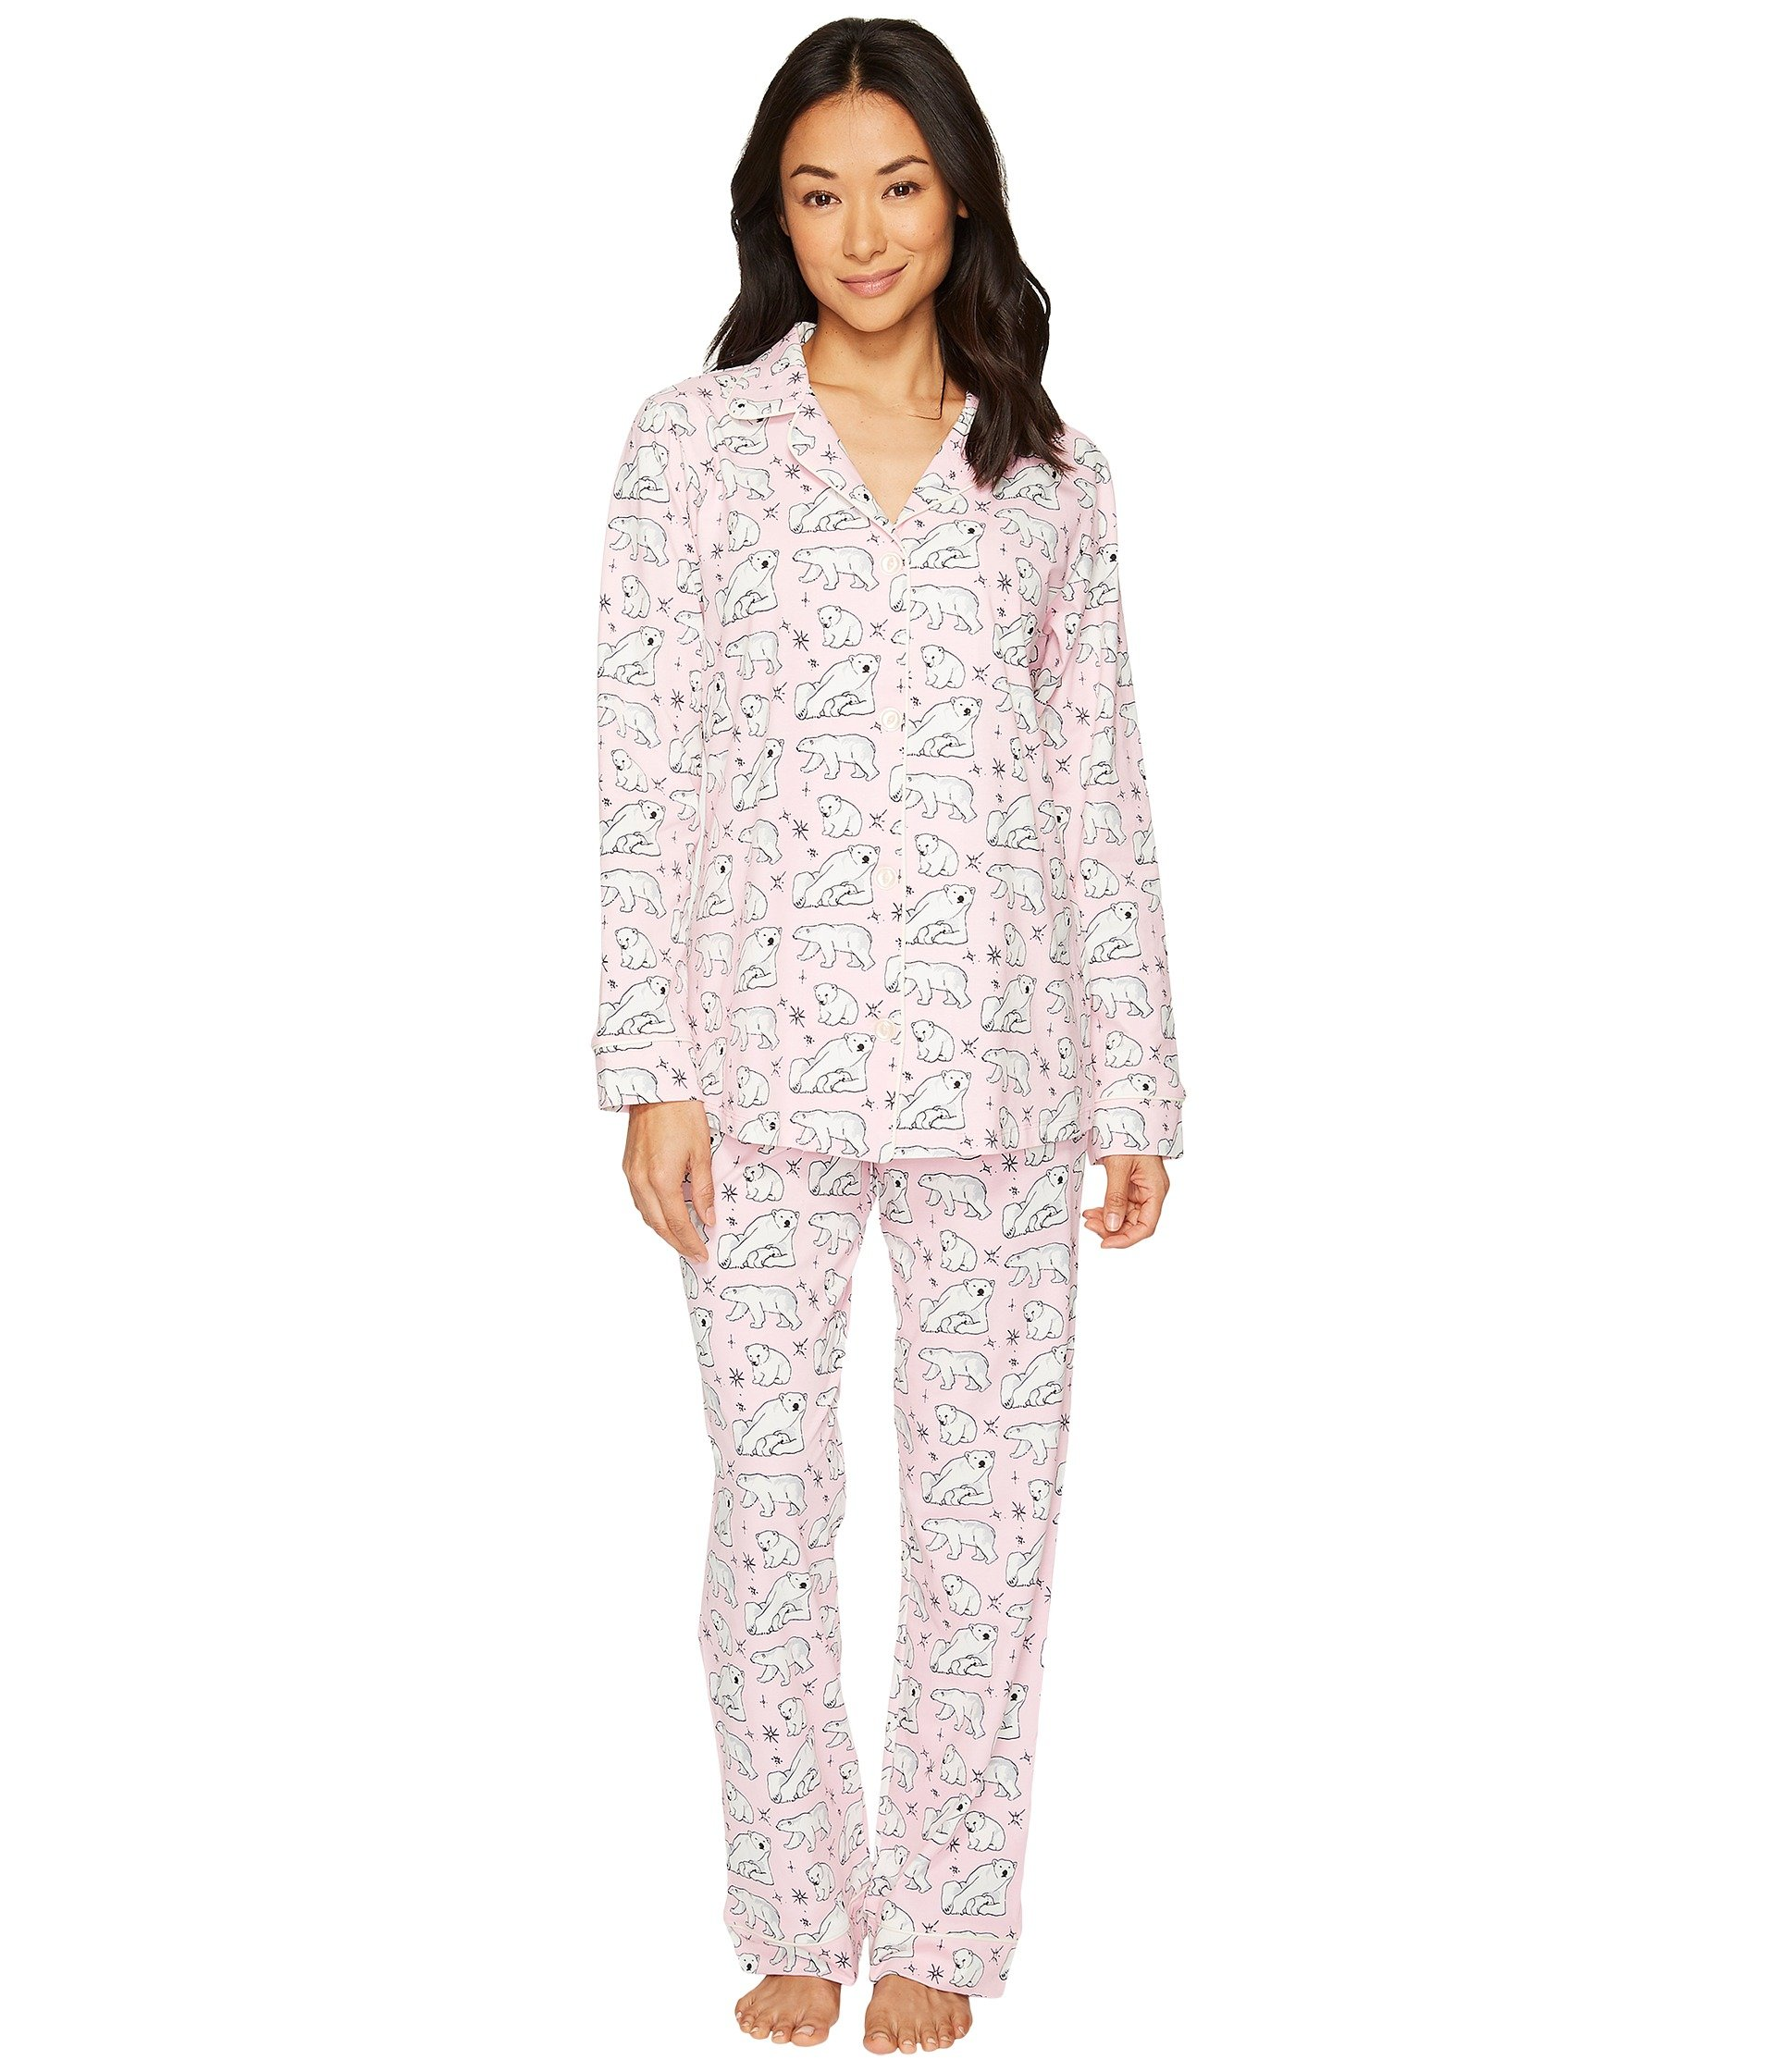 BedHead Women's Long Sleeve Classic Stretch Knit Pajama Set Pink Polar Bears X-Large